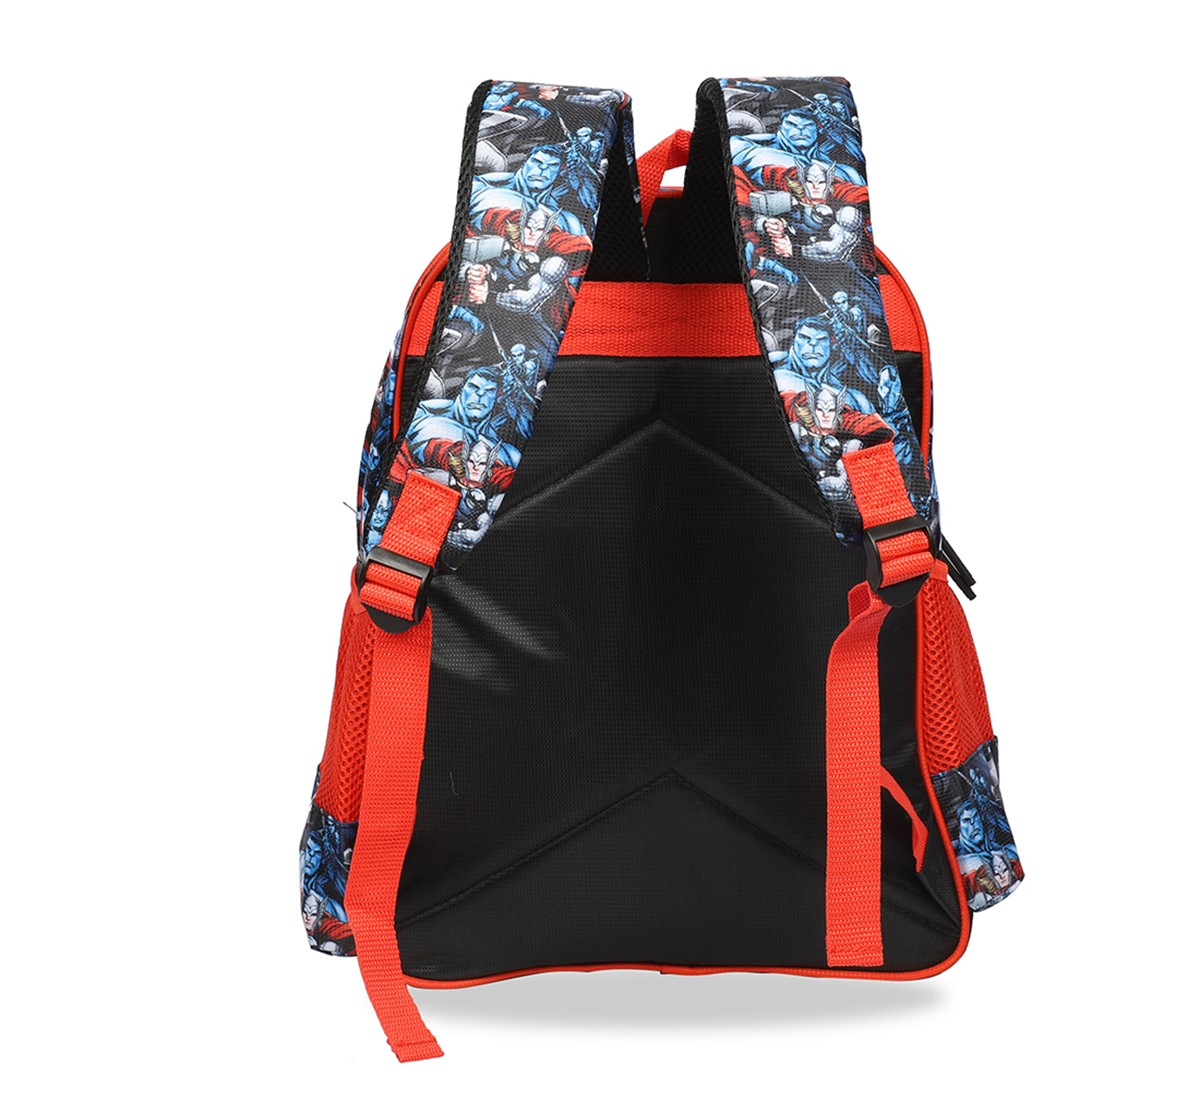 Marvel Avengers Assemble School Bag 46 Cm Bags for Boys age 10Y+